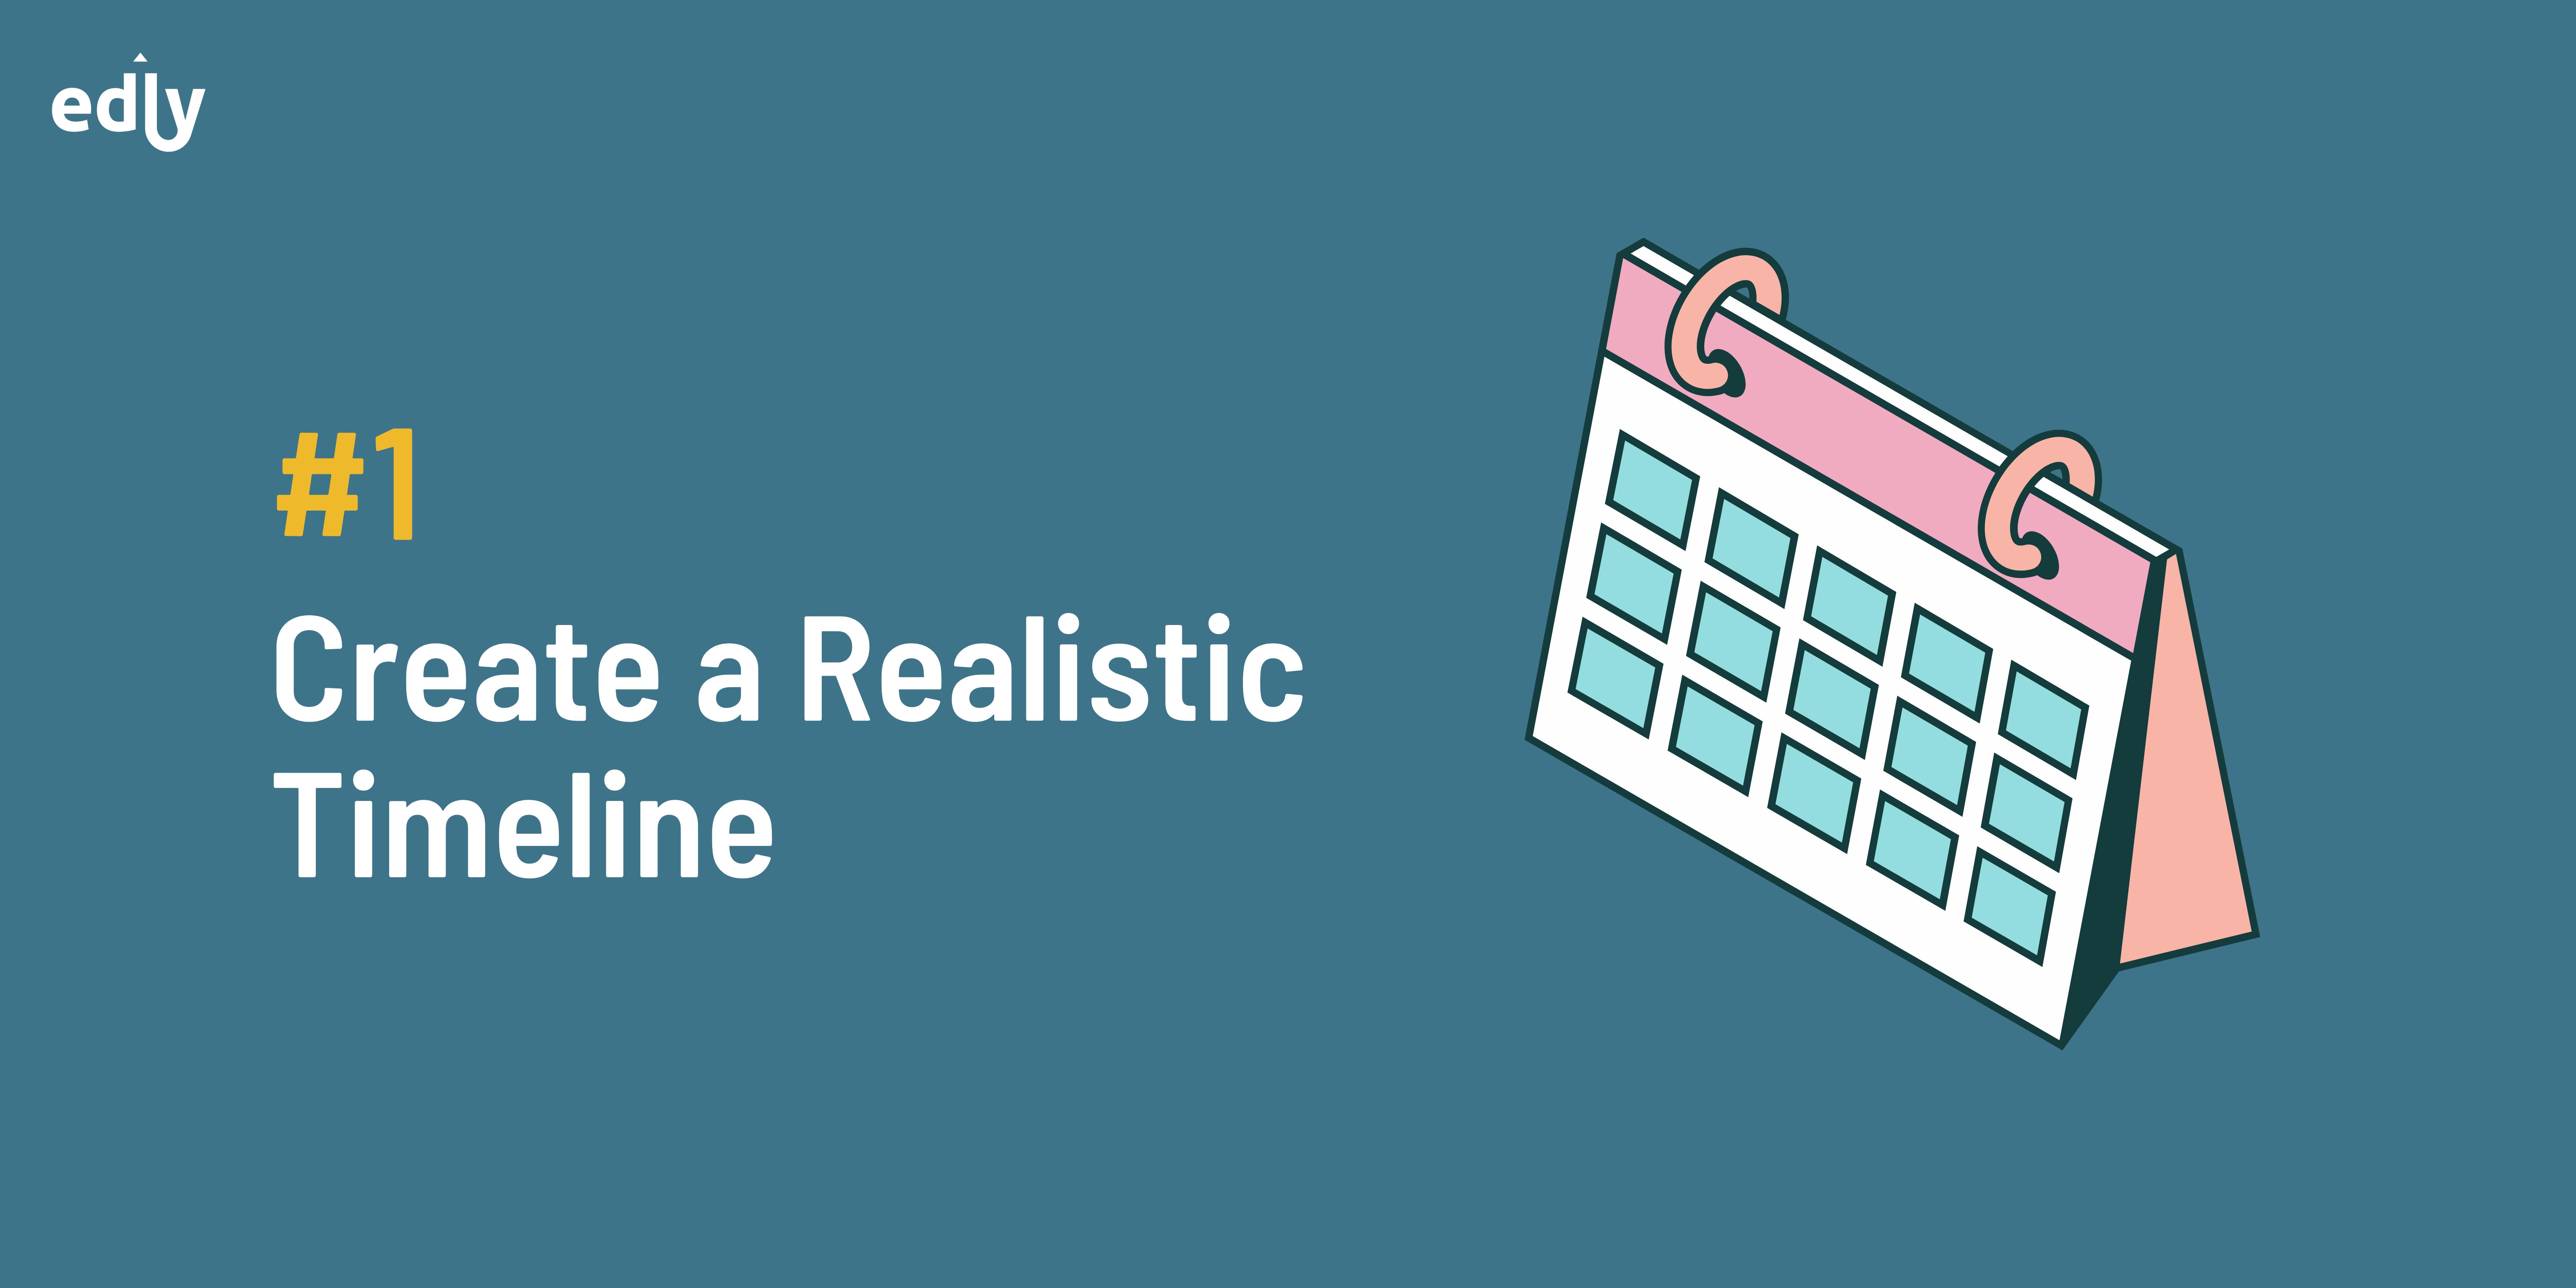 Create a Realistic Timeline